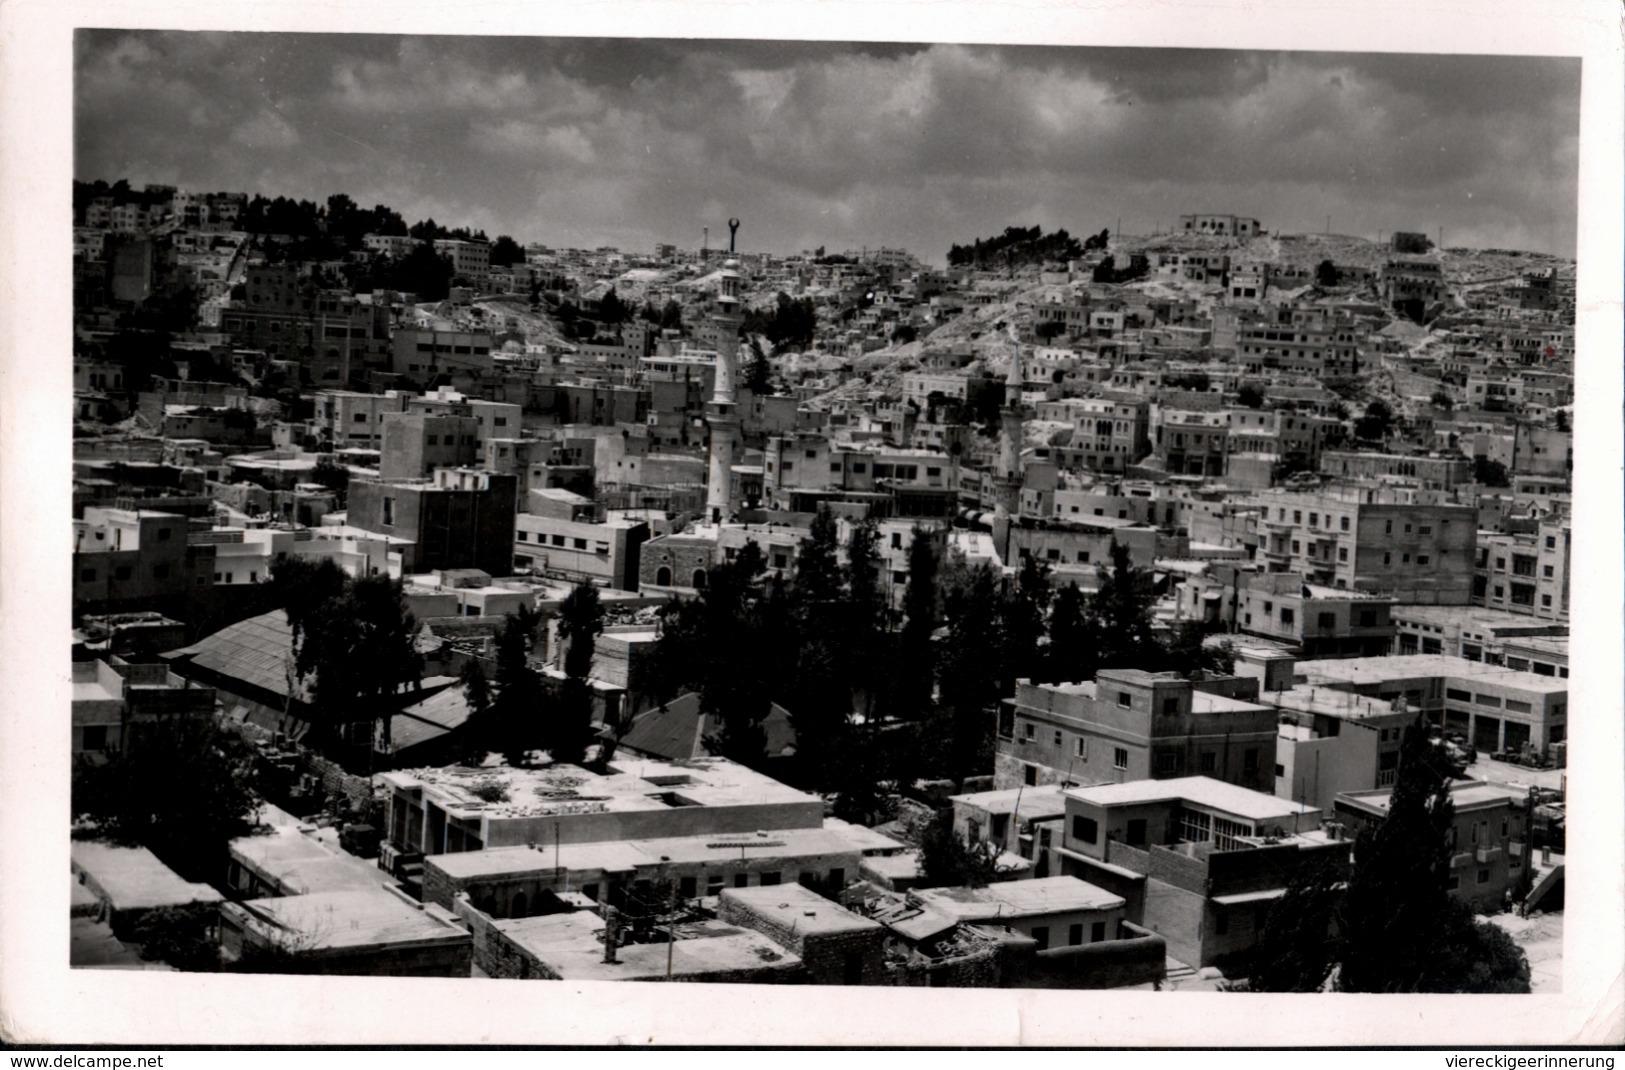 !  Postcard From Jordan, Jordanien Amman, 1958 - Jordanien